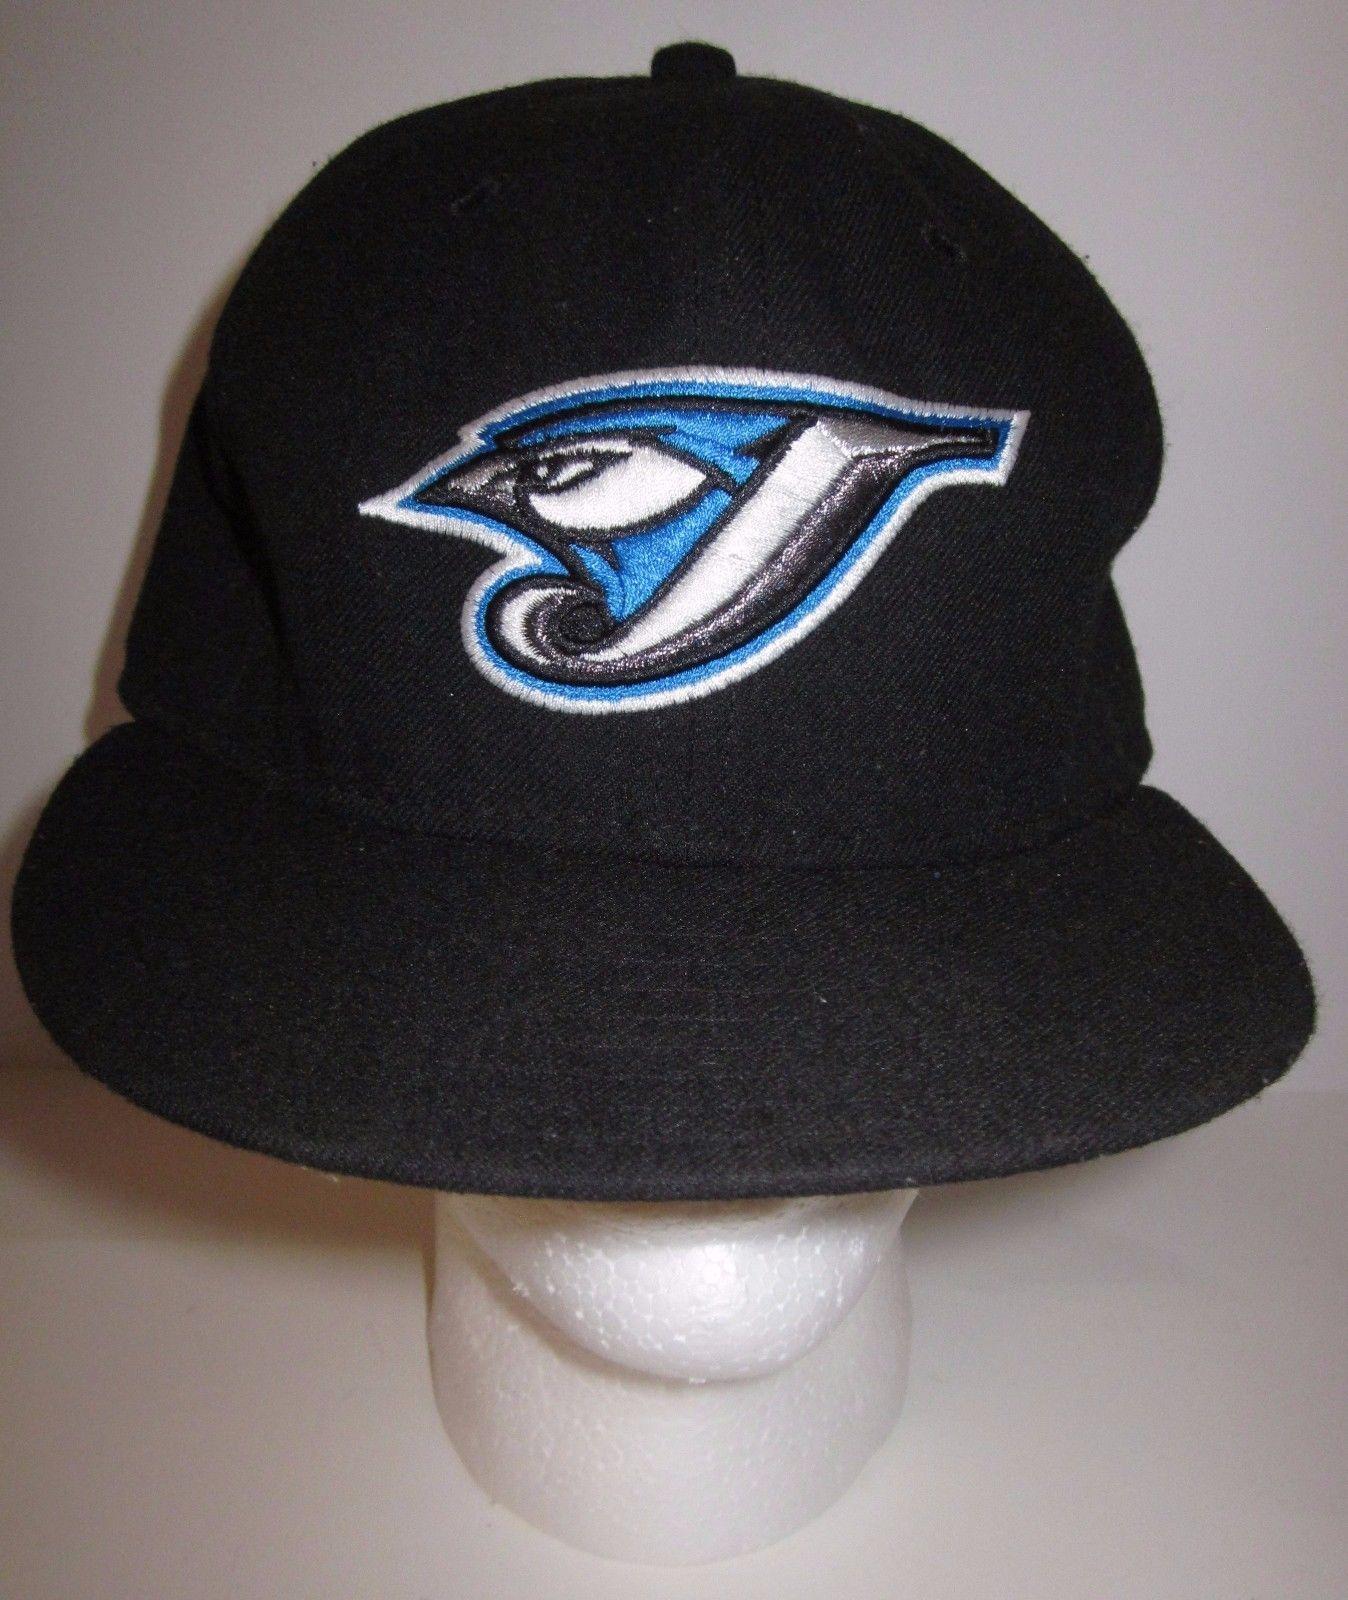 68d1e576 Toronto Blue Jays Hat Cap - New Era Cool and 50 similar items. S l1600